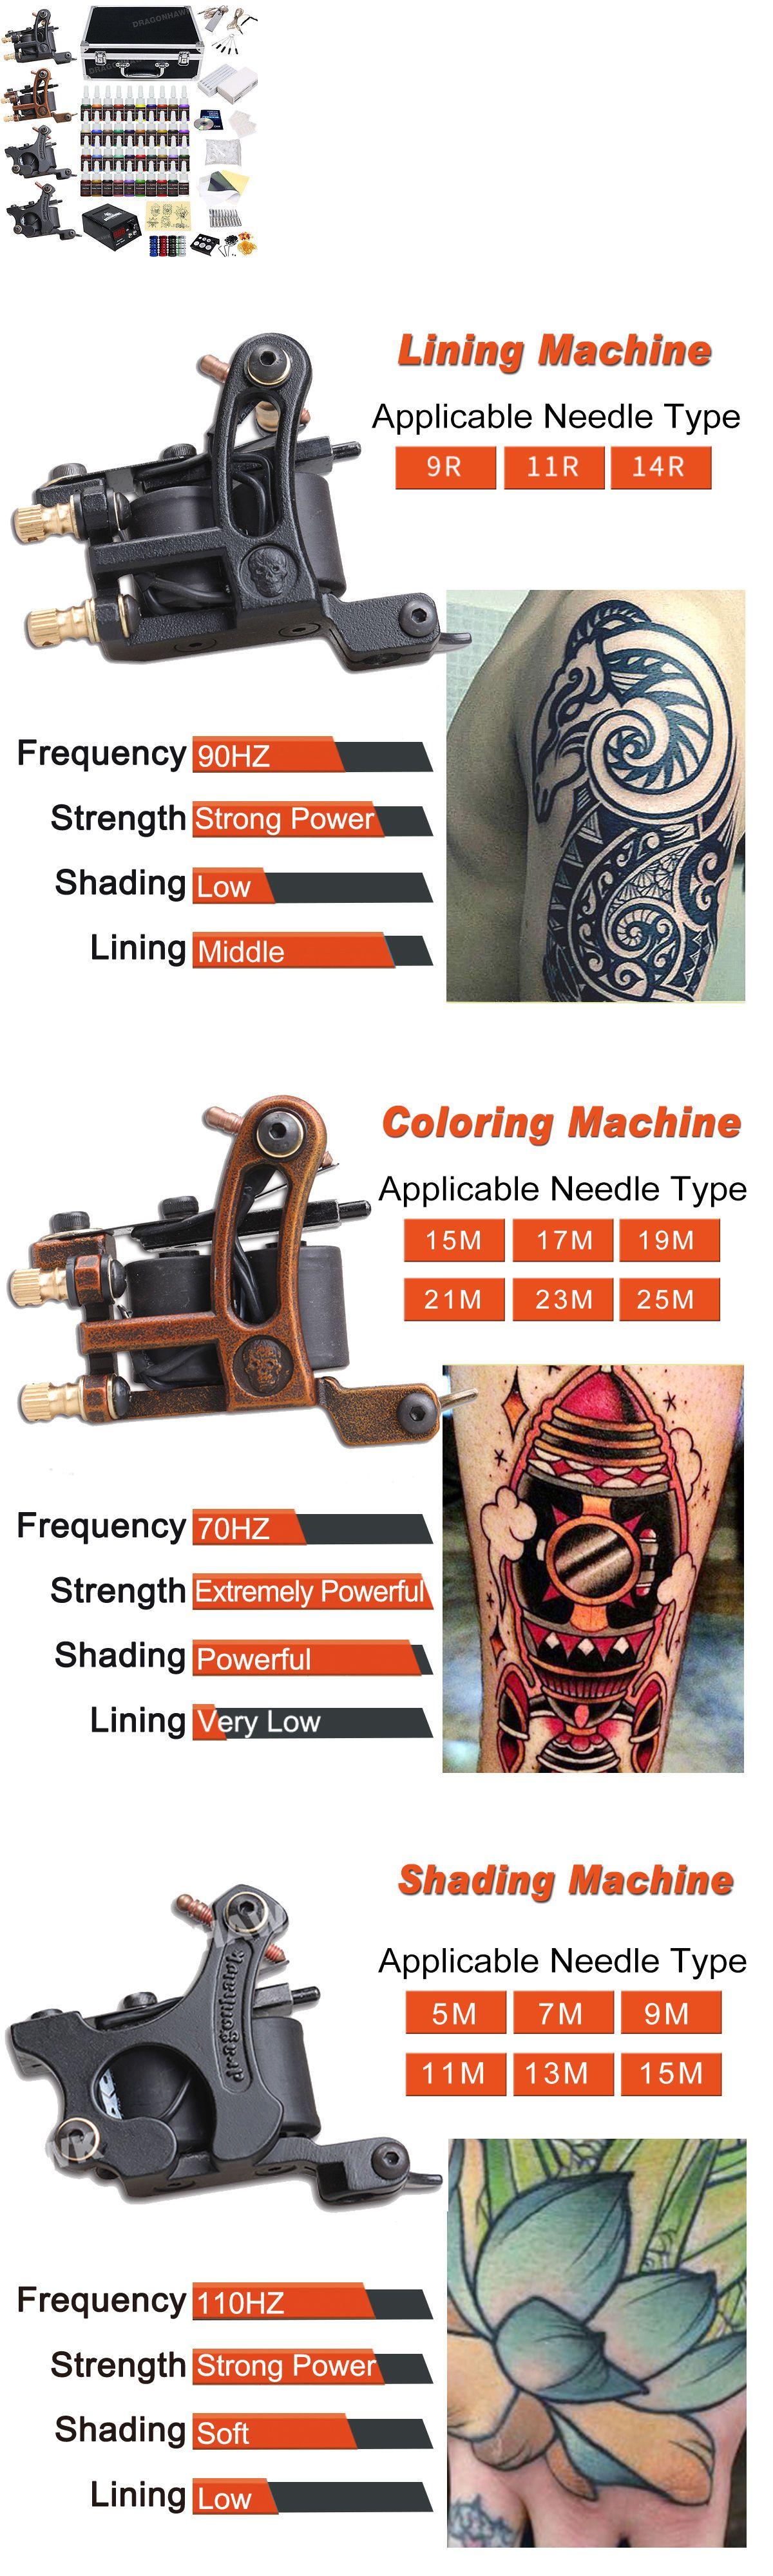 Tattoo Complete Kits Tattoo Kit 4 Machine Guns 40 Color Inks Set Equipment Power Supply Box D139wd 11 Buy It Now Only Tattoo Kits Tattoo Needle Sizes Tattoos